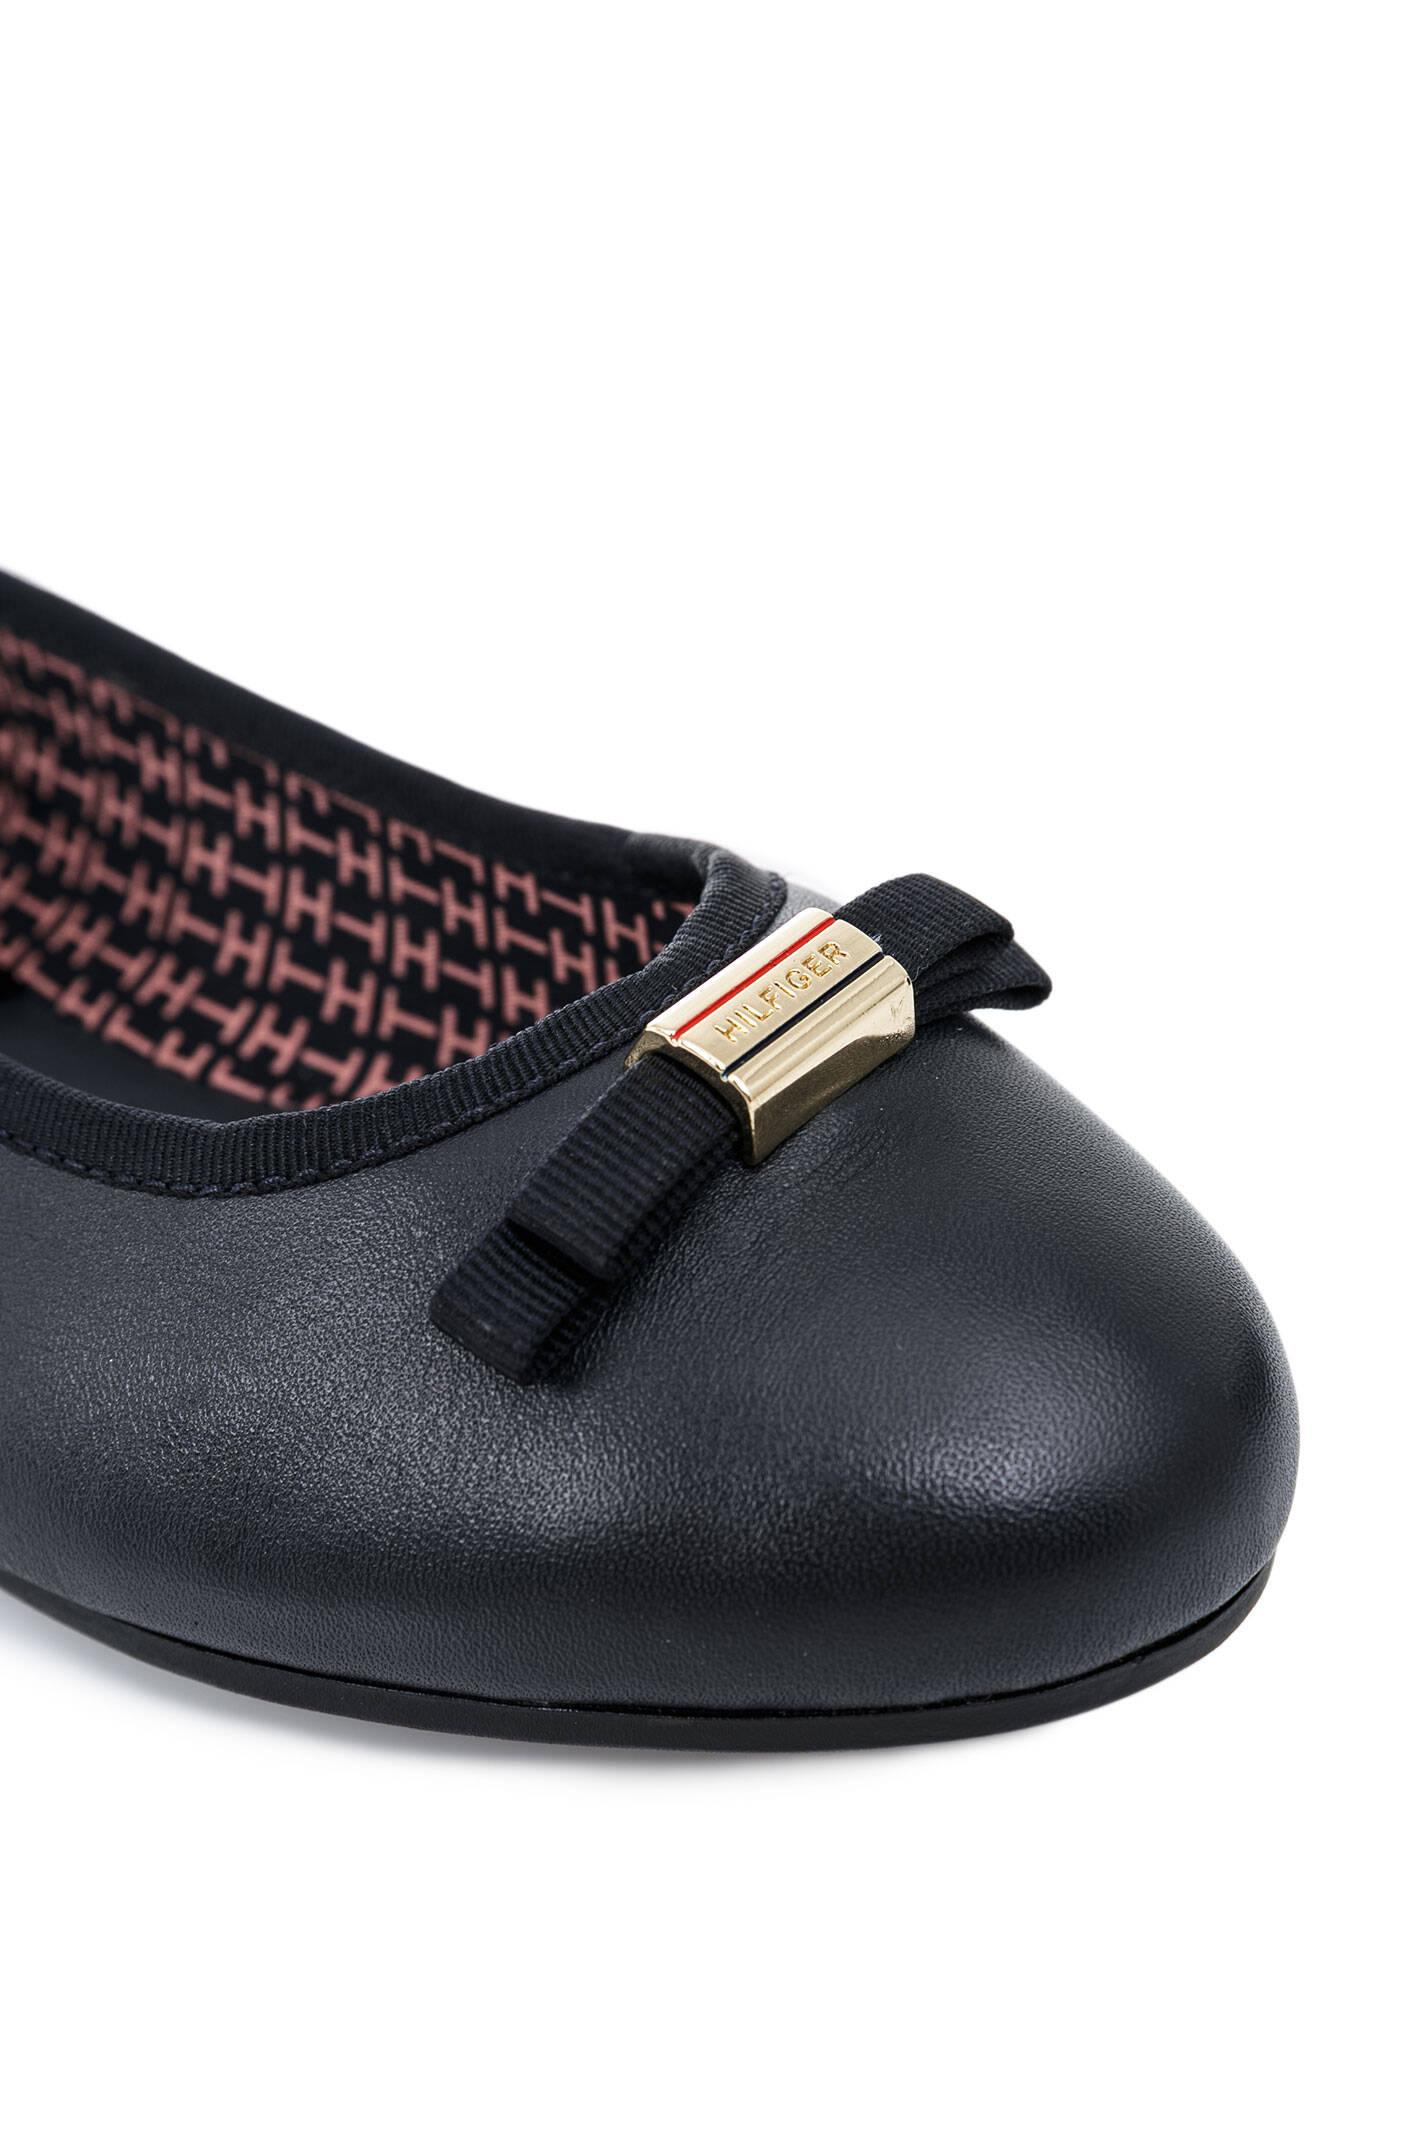 amy 37a ballerinas tommy hilfiger navy blue shoes. Black Bedroom Furniture Sets. Home Design Ideas